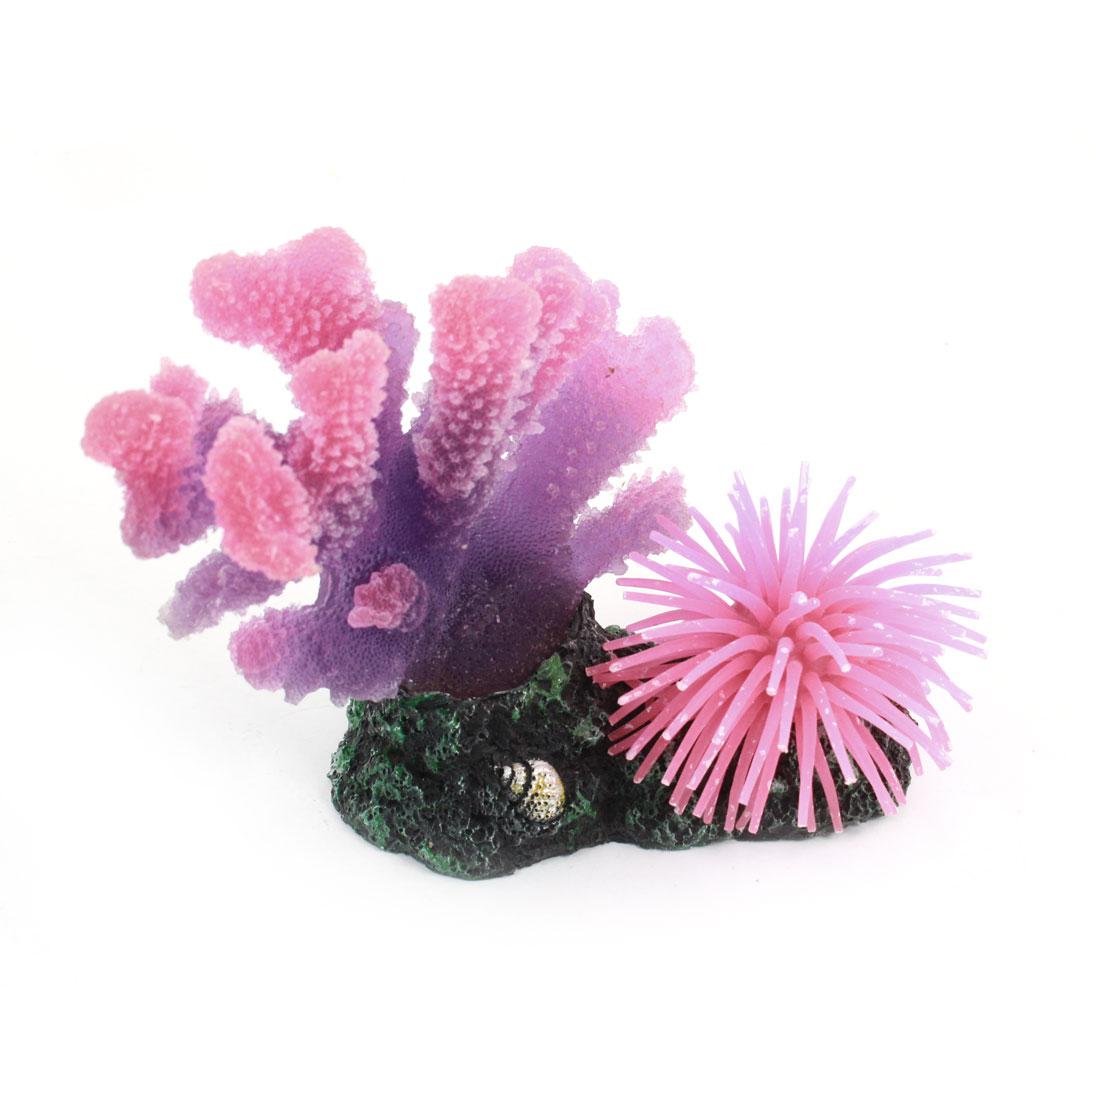 Aquarium Ornament Artificial Ceramic Base Purple Pink Coral 13cm Height